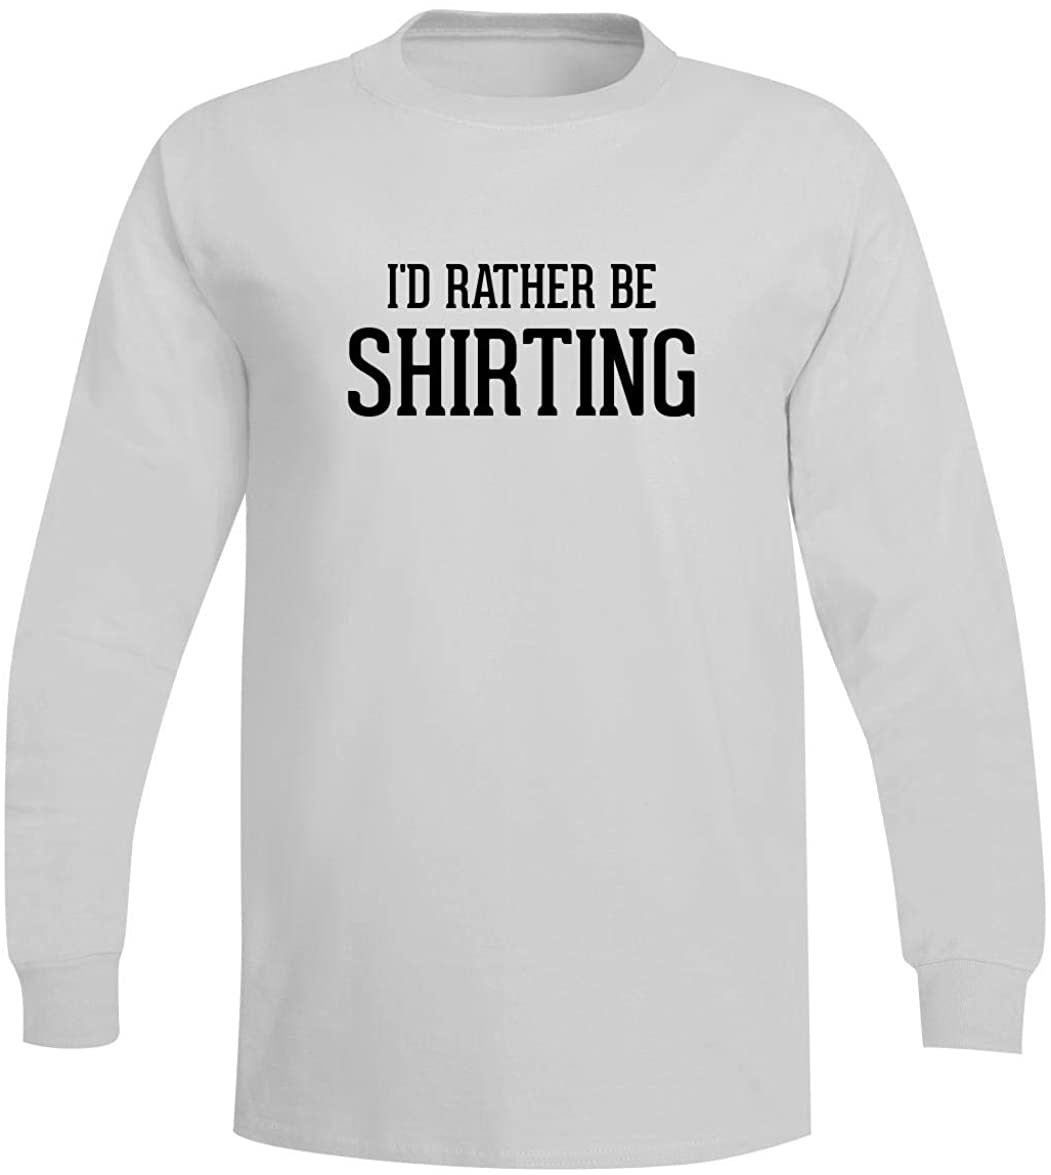 I'd Rather Be SHIRTING - A Soft & Comfortable Men's Long Sleeve T-Shirt